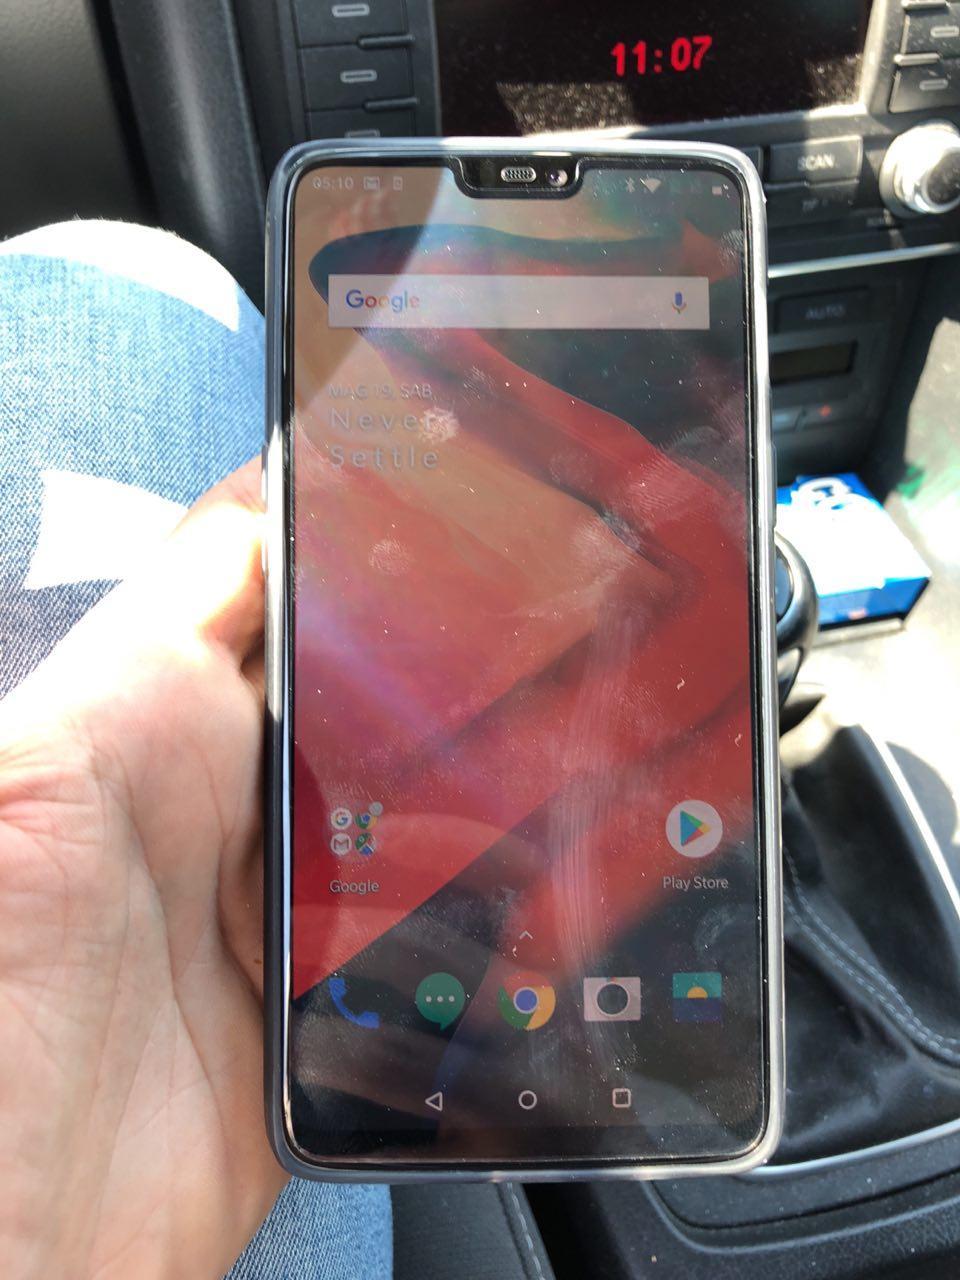 OnePlus 6 arrivato tramite Amazon   Evosmart.it